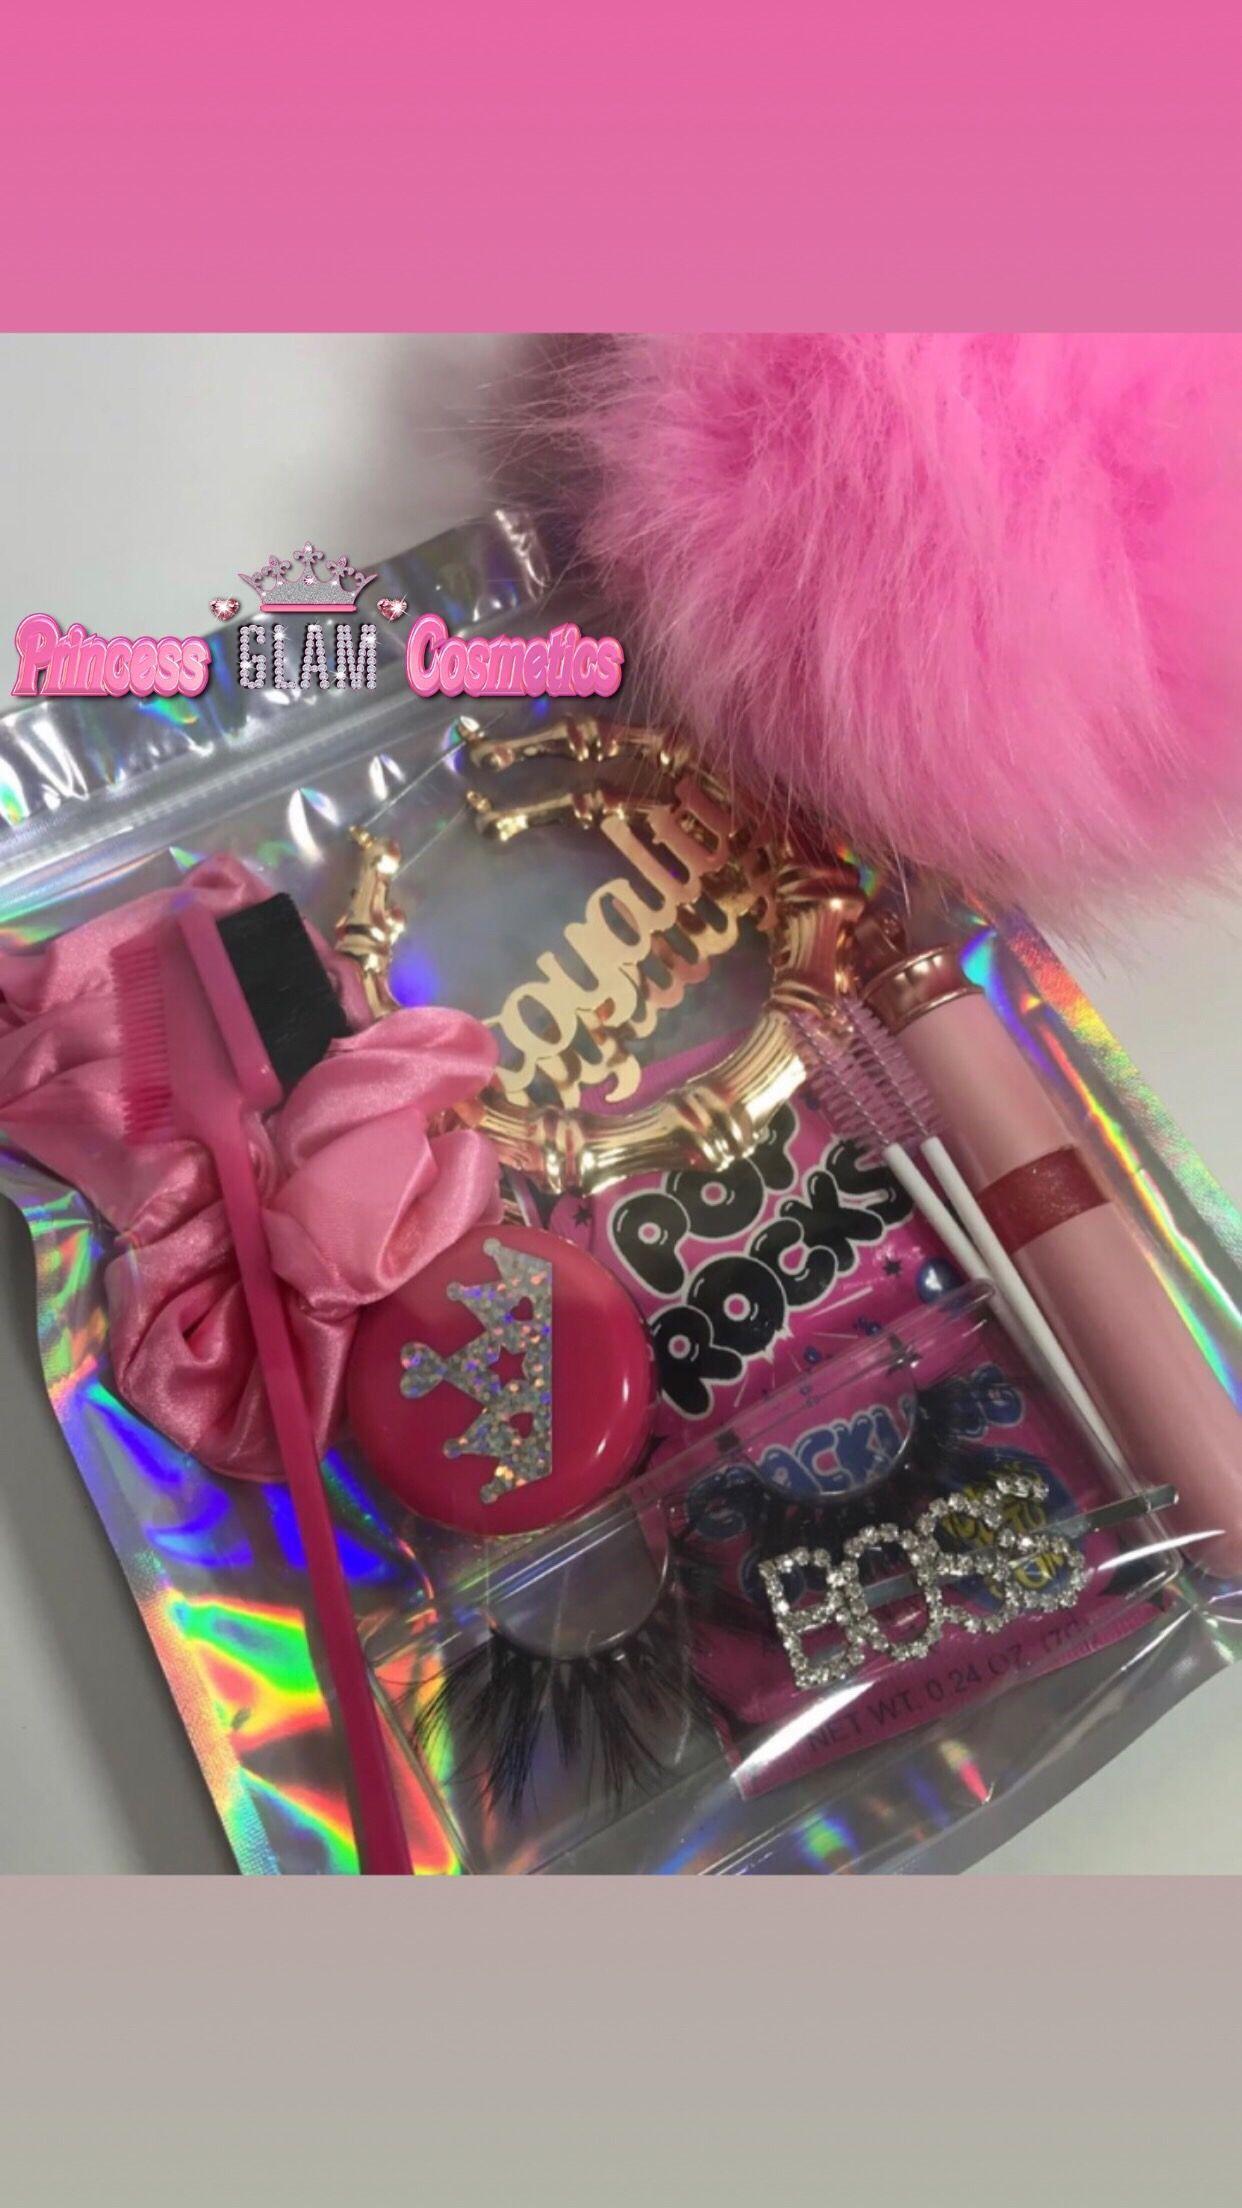 Lip Gloss Business Ideas Lip Gloss Homemade Lip Gloss Cosmetics Diy Lip Gloss